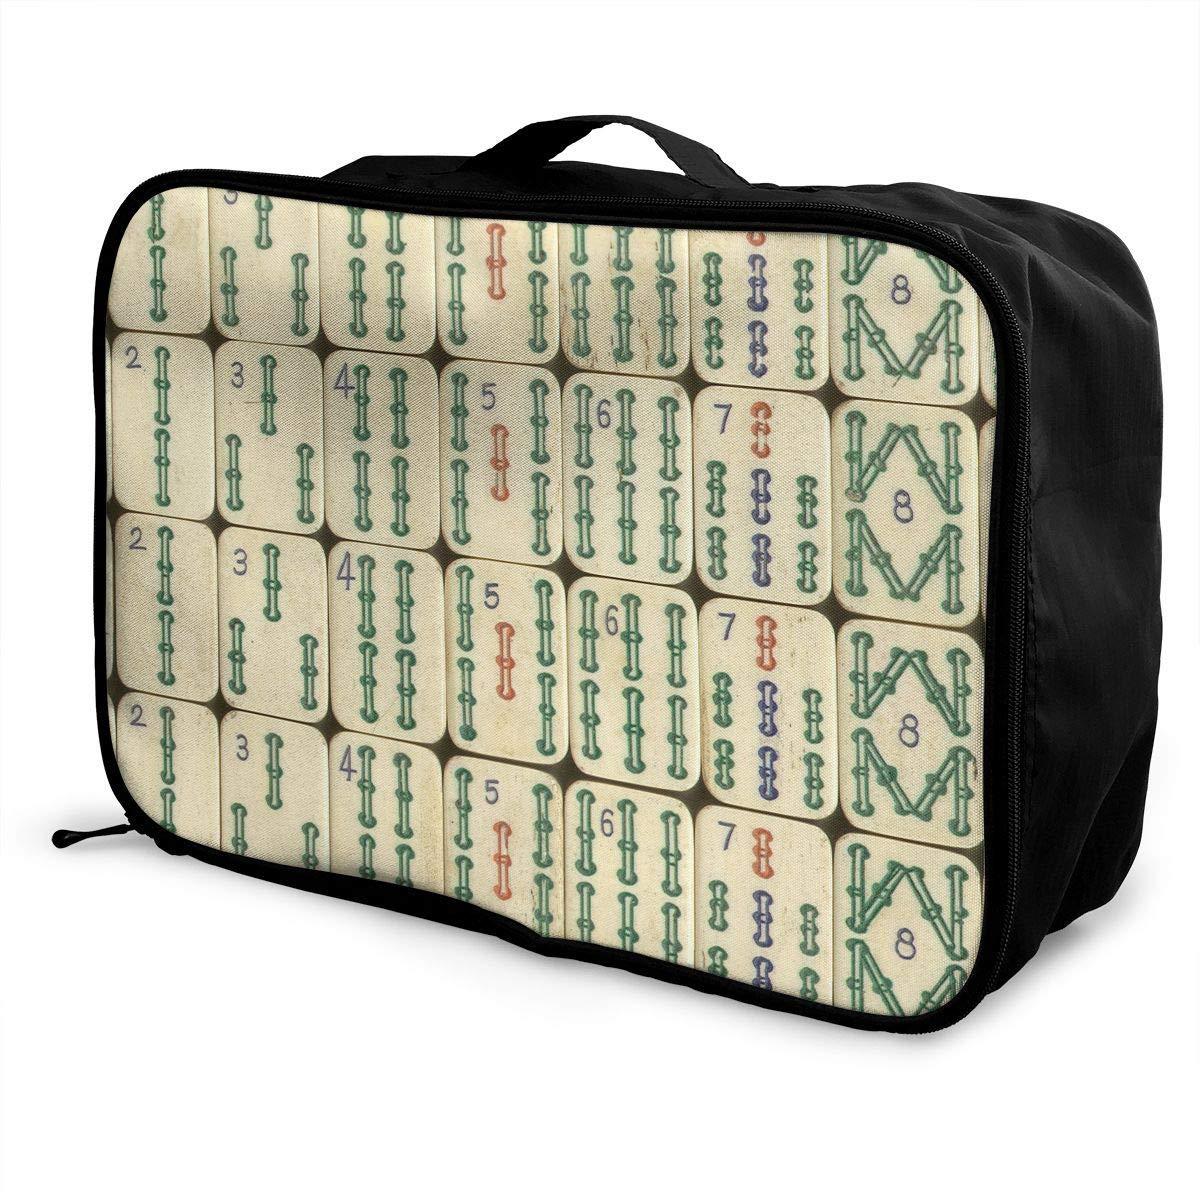 JTRVW Luggage Bags for Travel Cool China Mahjong Travel Duffel Bag Waterproof Fashion Lightweight Large Capacity Portable Duffel Bag for Men /& Women